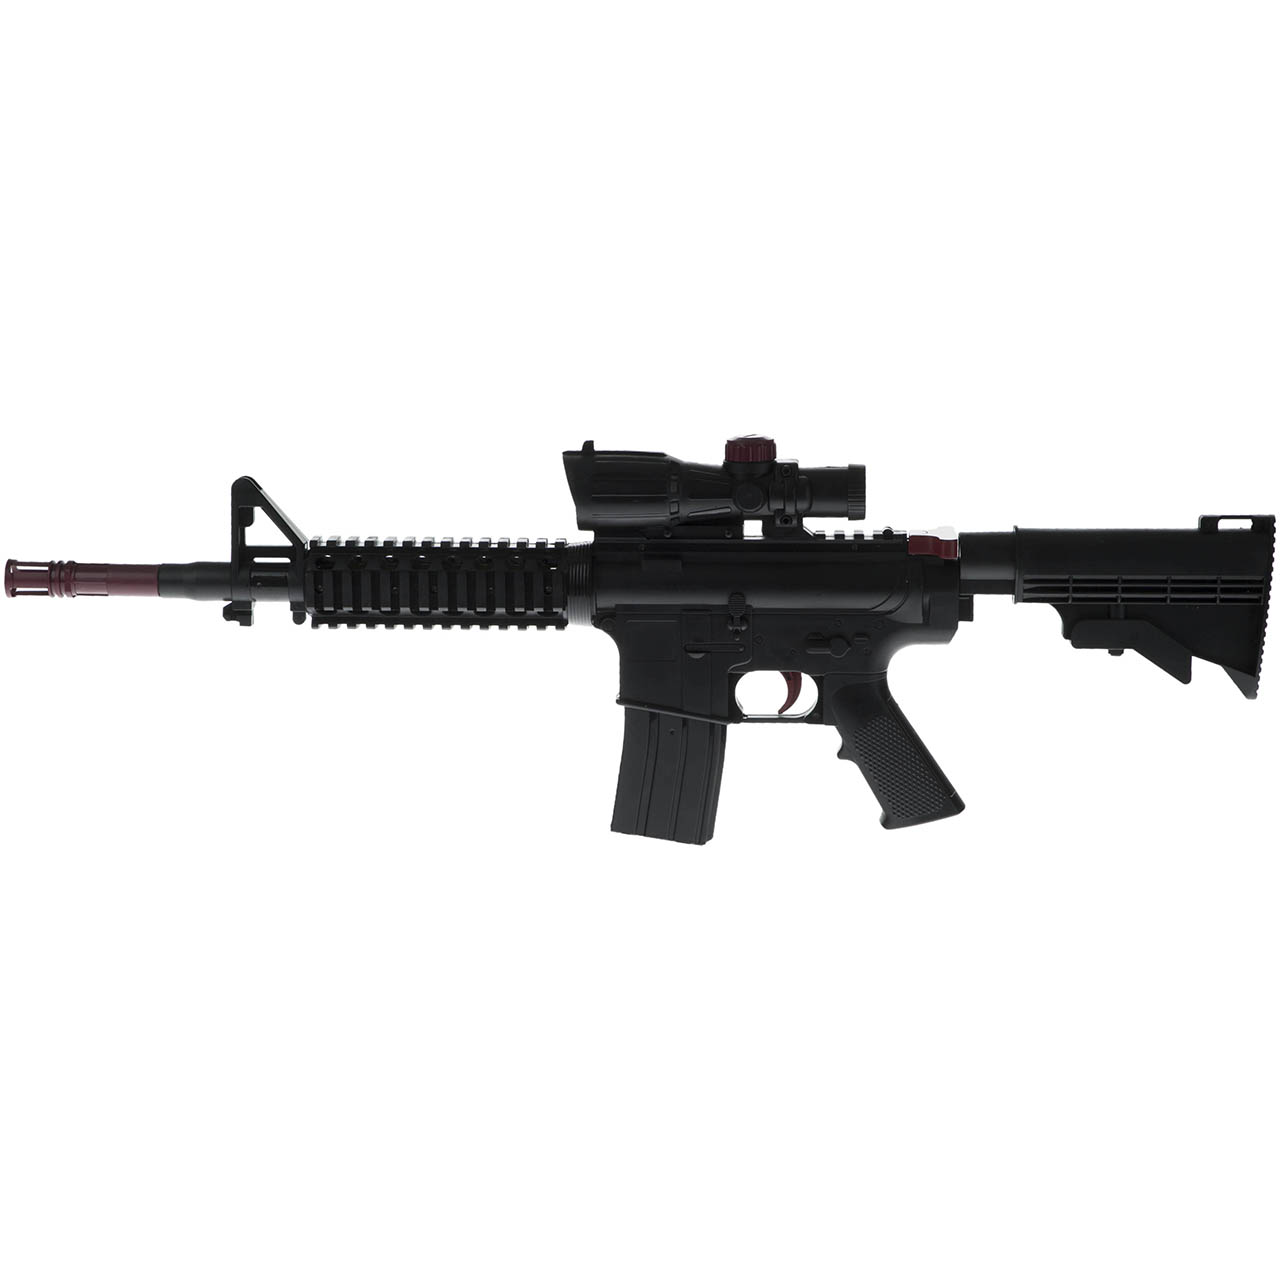 تفنگ اسباب بازی مدل ASSAULT SUPER M16 کد M16